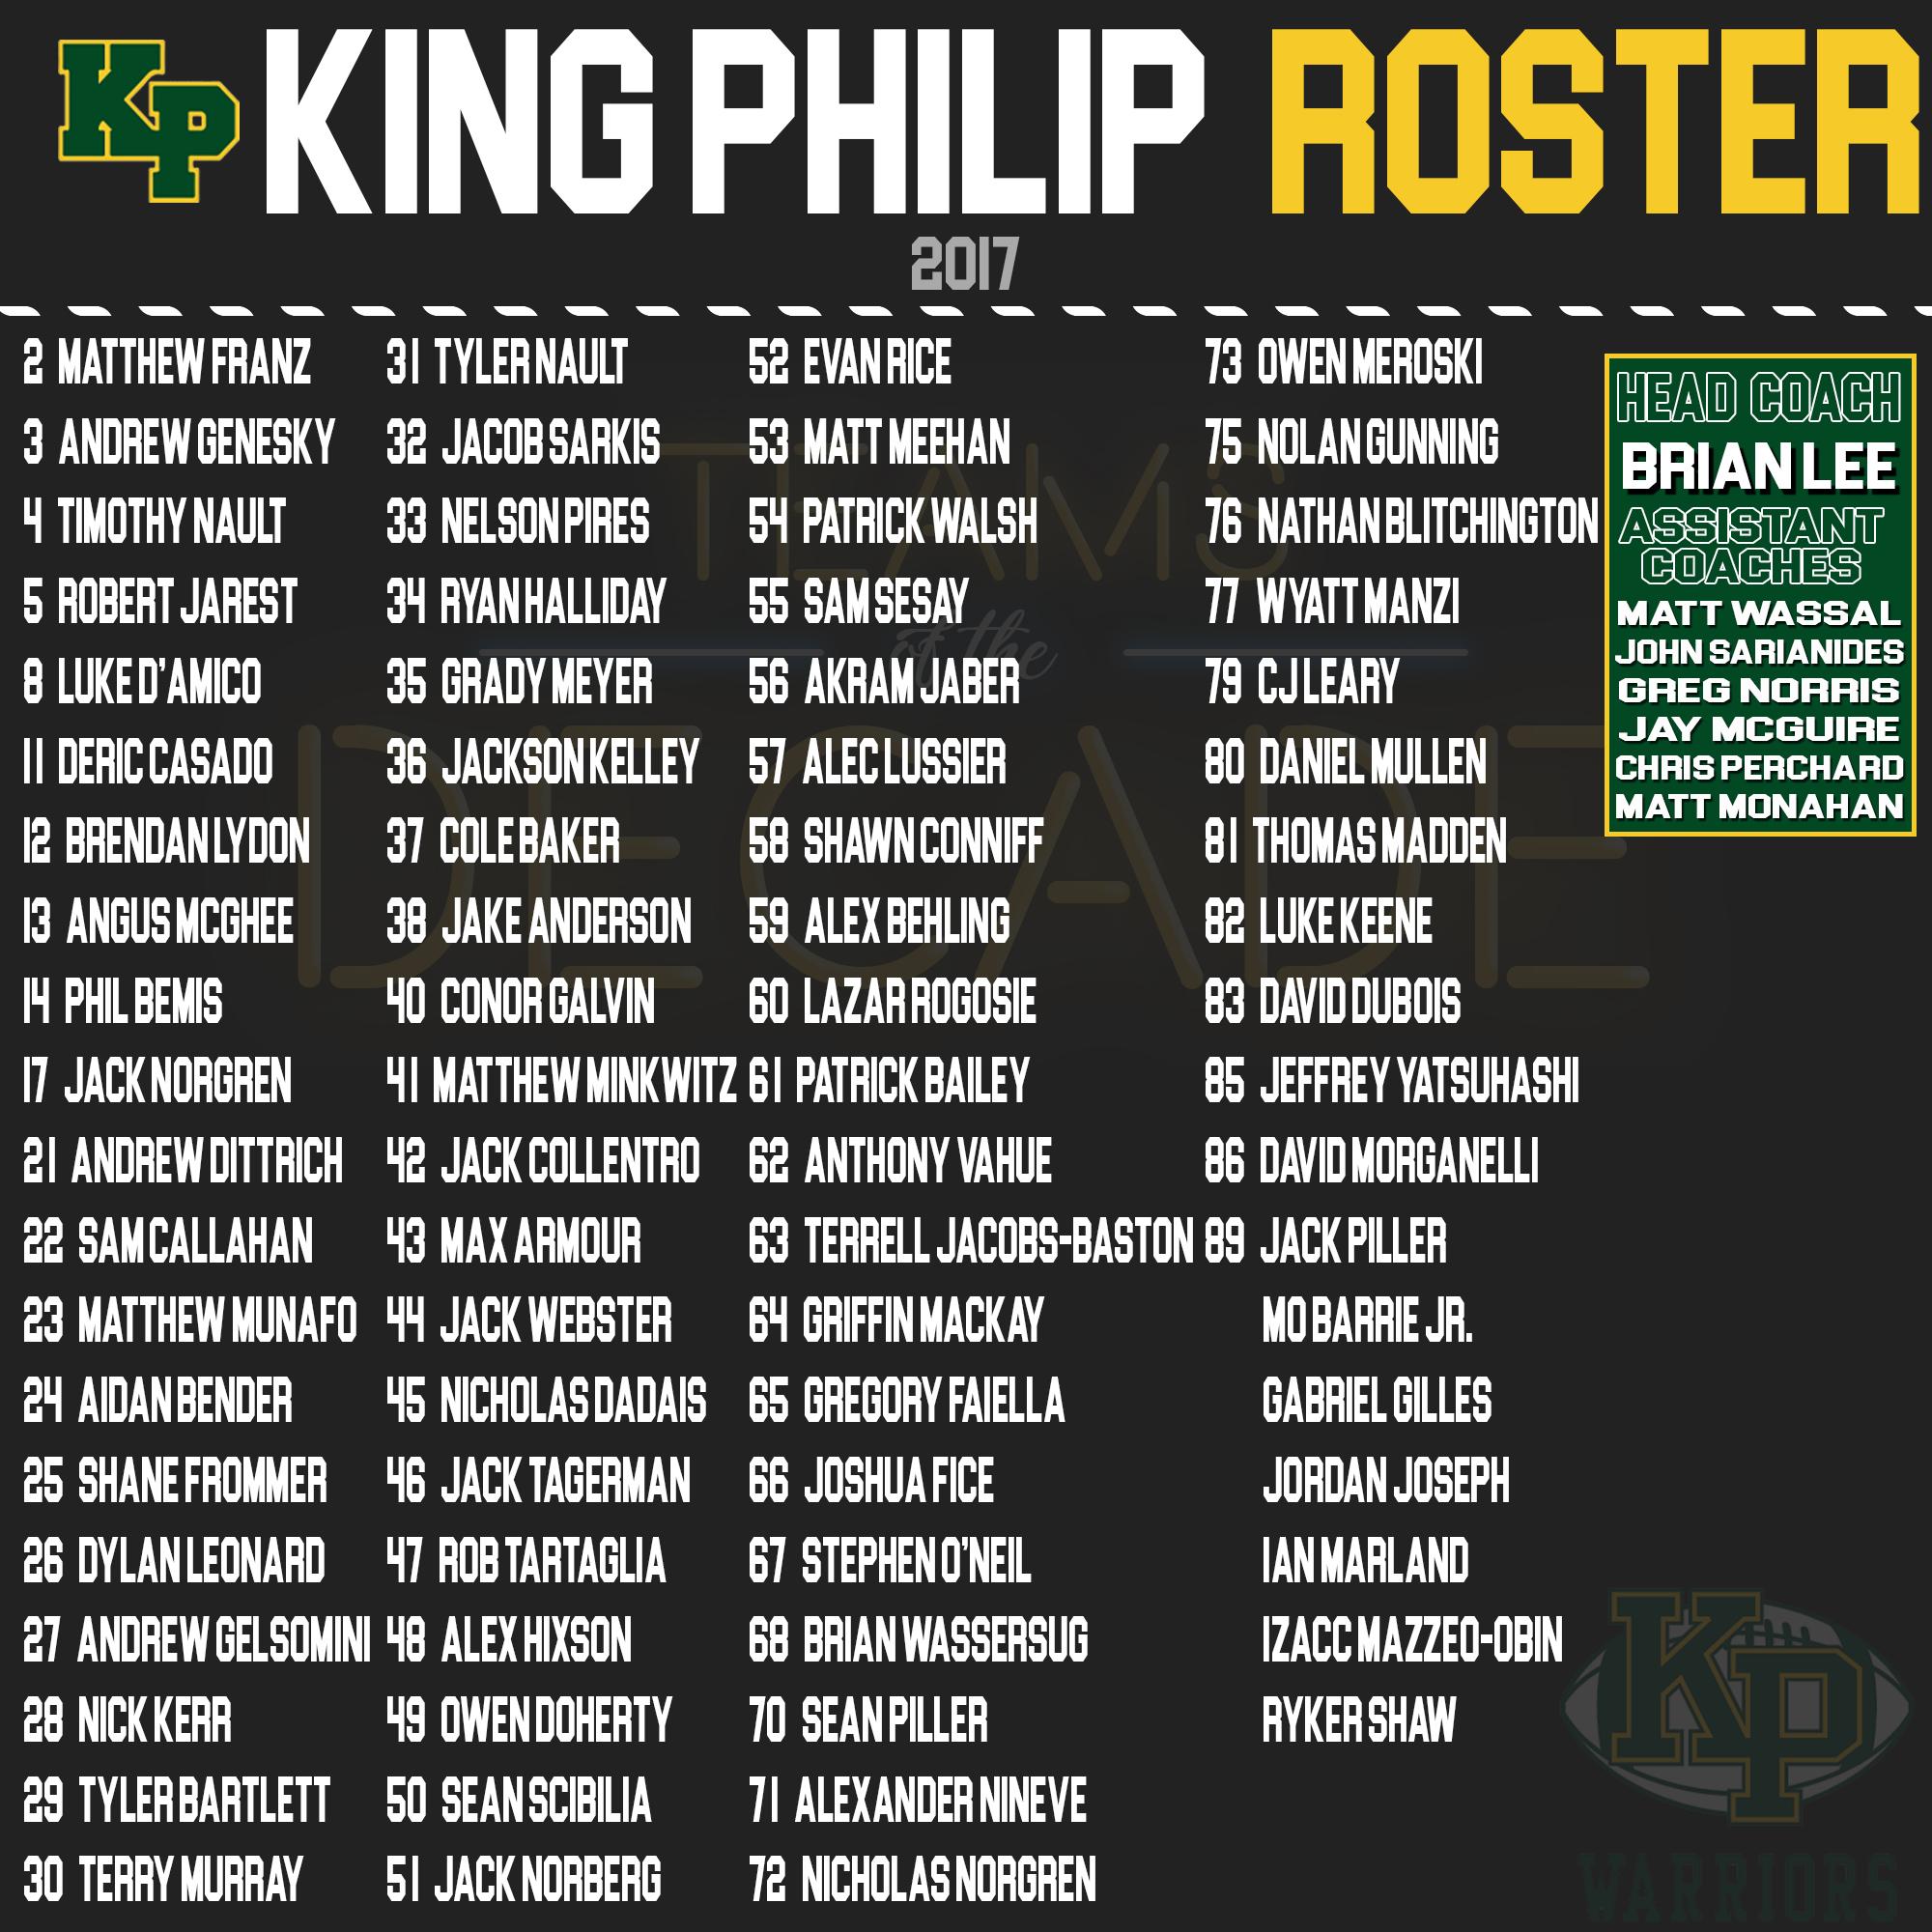 King Philip football